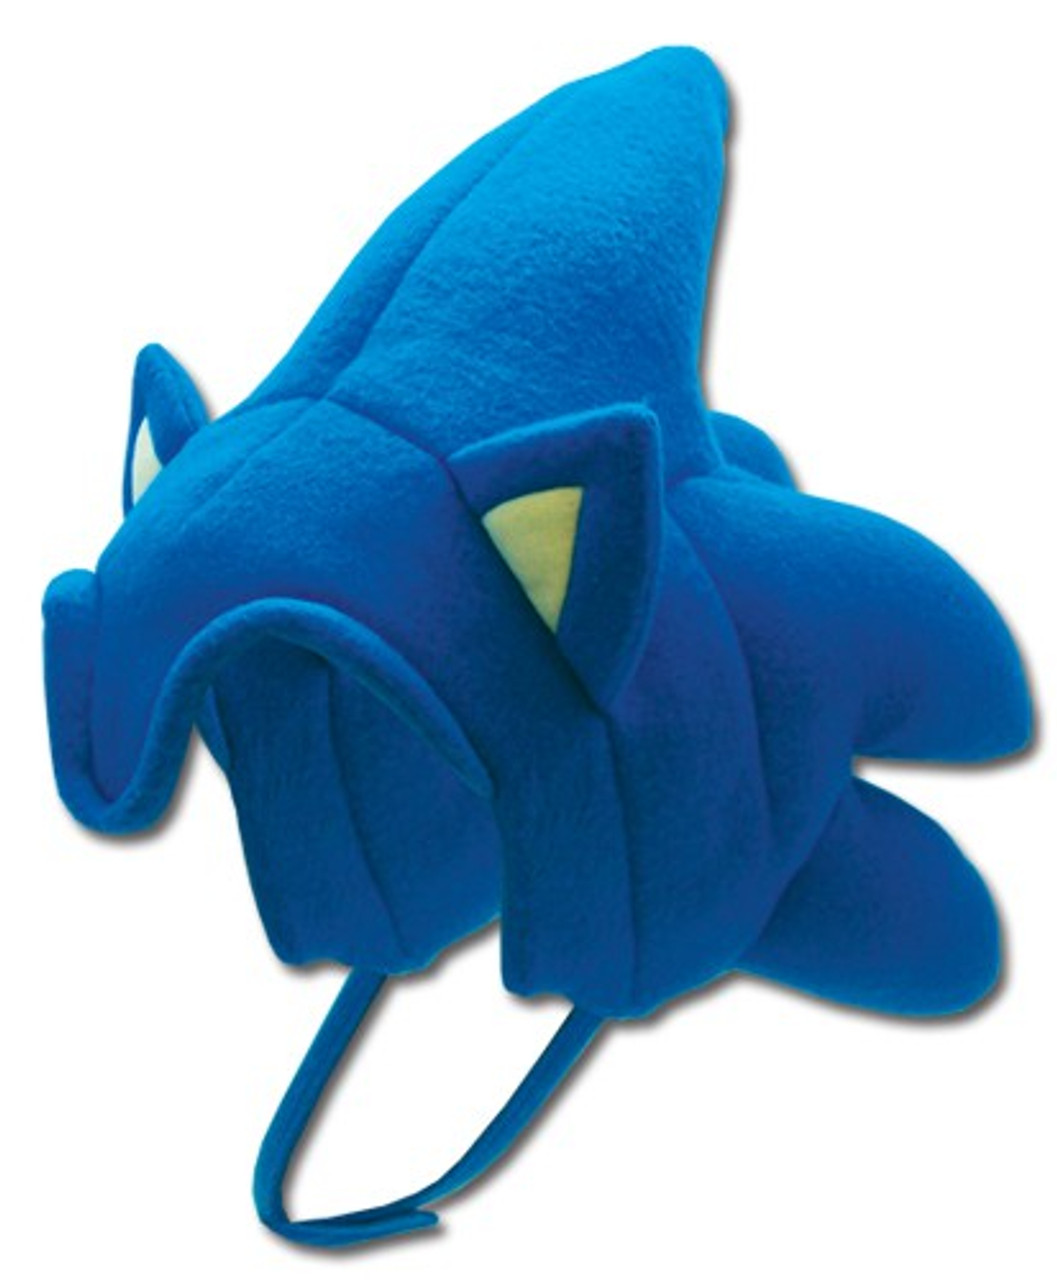 Sonic The Hedgehog Sonic The Hedgehog Fleece Cap Partial Face Ge Animation Toywiz